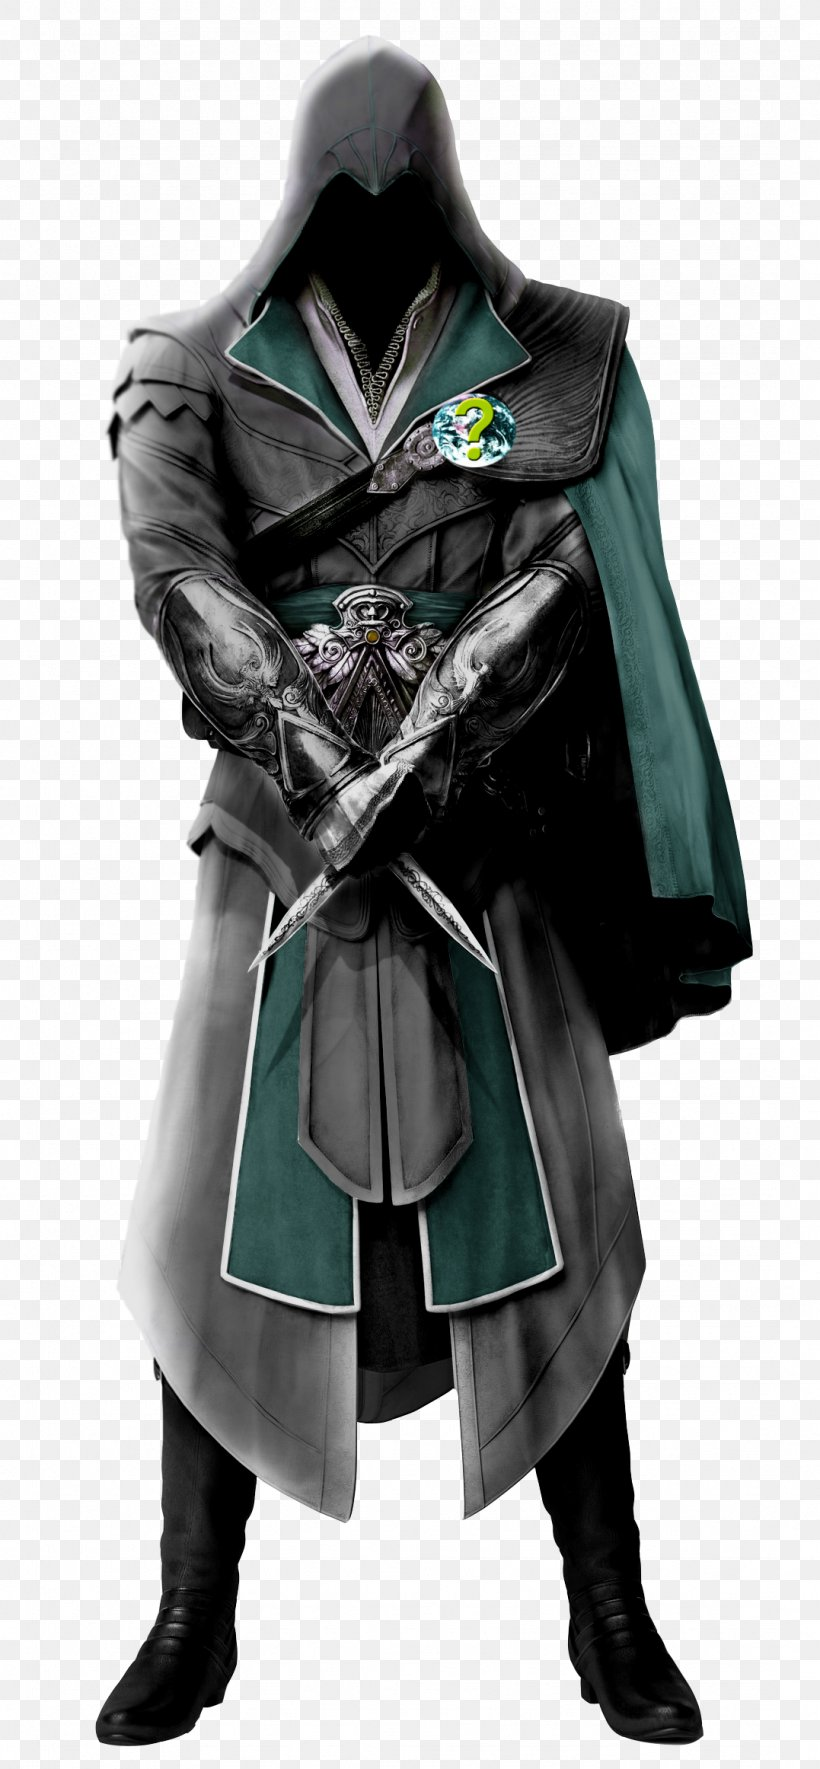 Assassin's Creed III Assassin's Creed: Revelations Assassin's Creed: Brotherhood Assassin's Creed: Origins, PNG, 1077x2324px, Assassin S Creed, Assassin S Creed Iii, Assassins, Concept Art, Costume Download Free